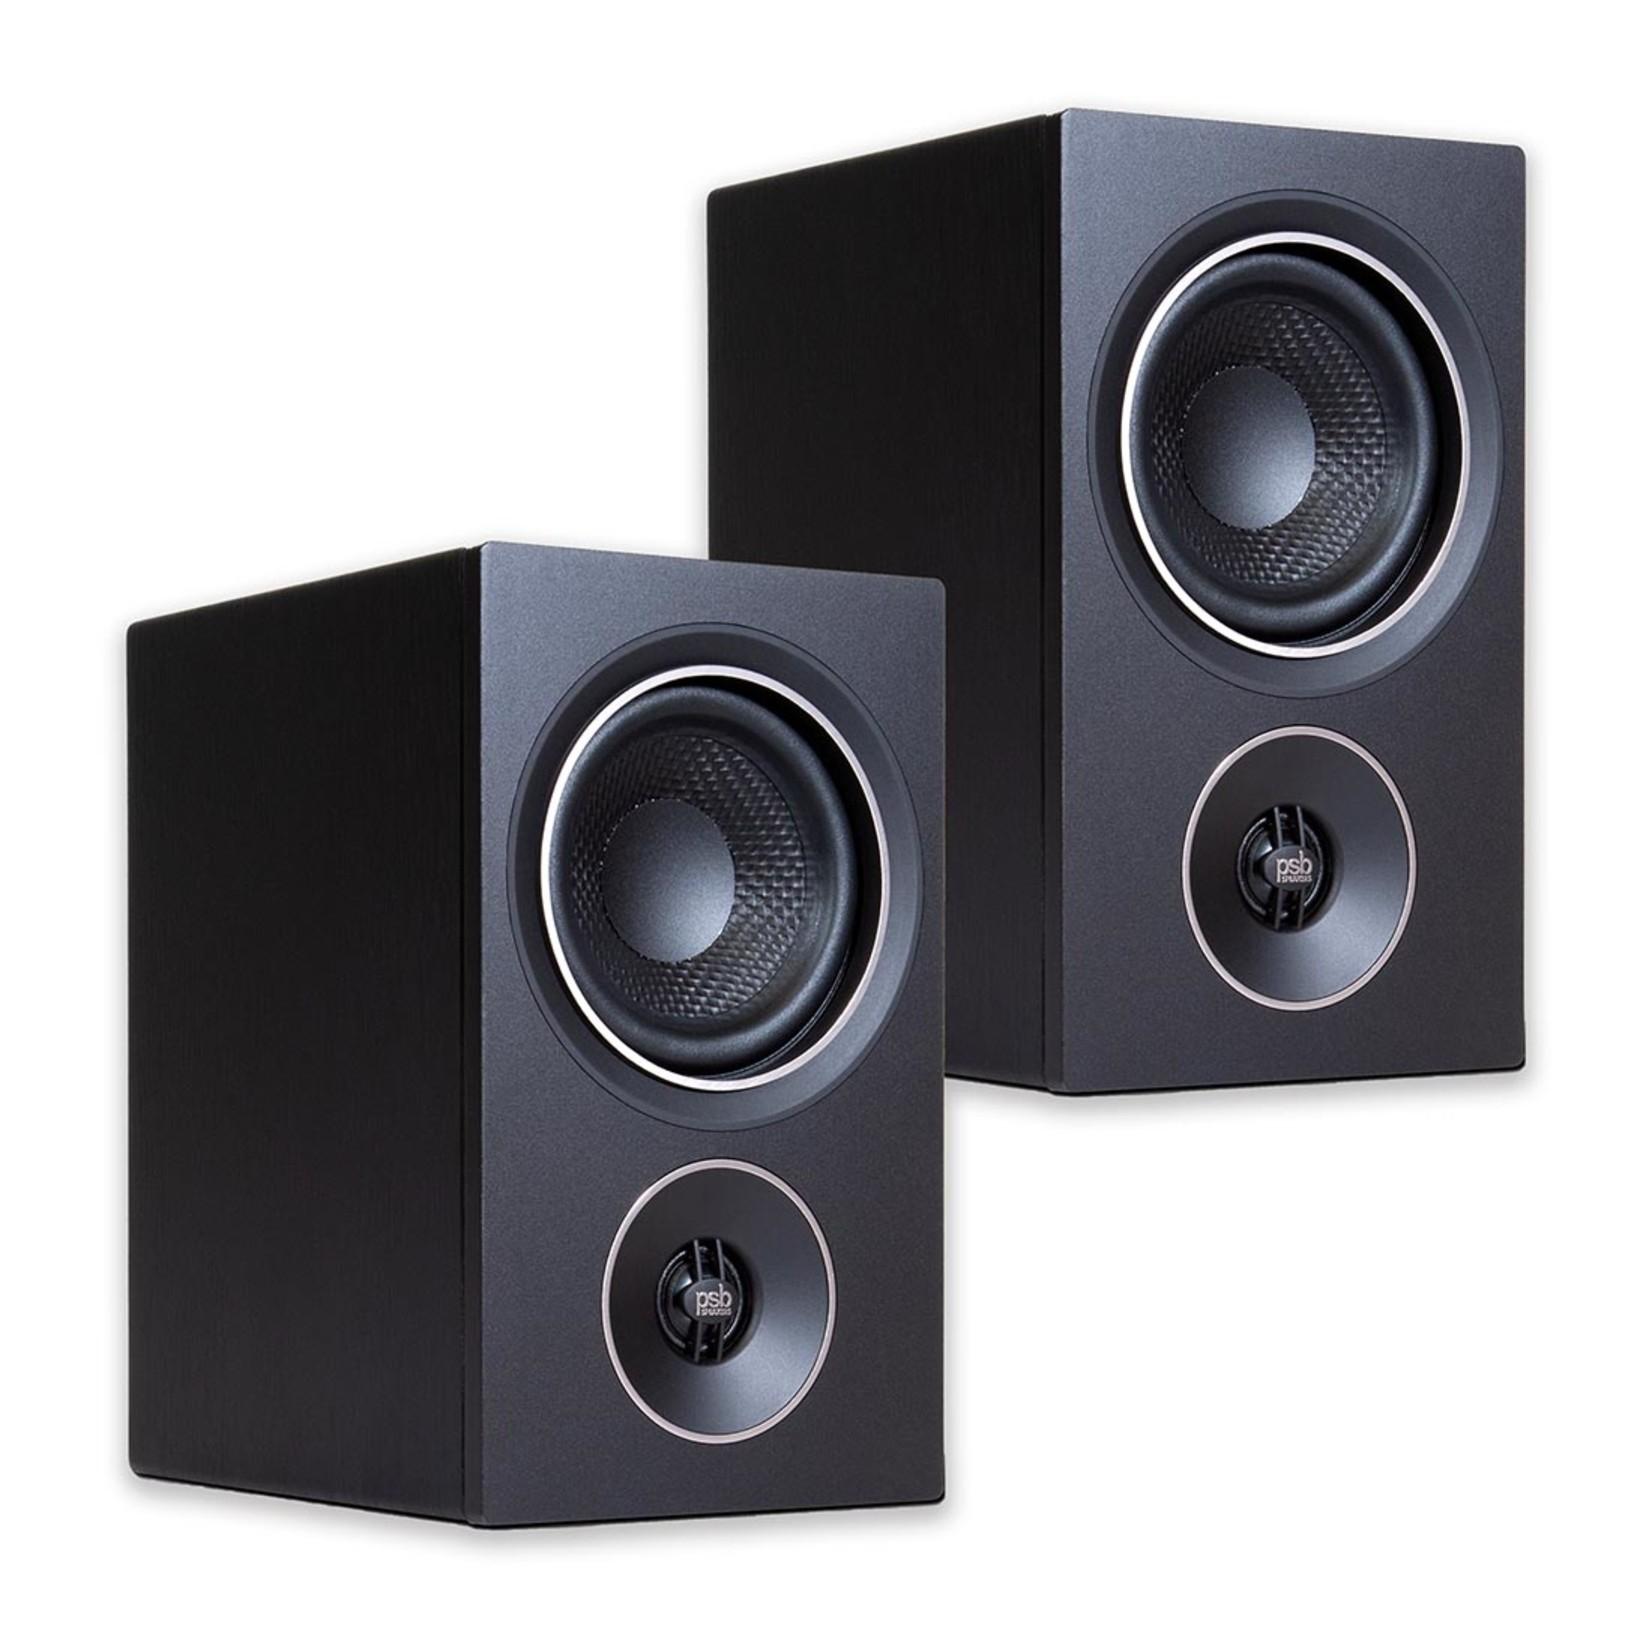 Accessory PSB - Alpha P3 Black Ash Speakers